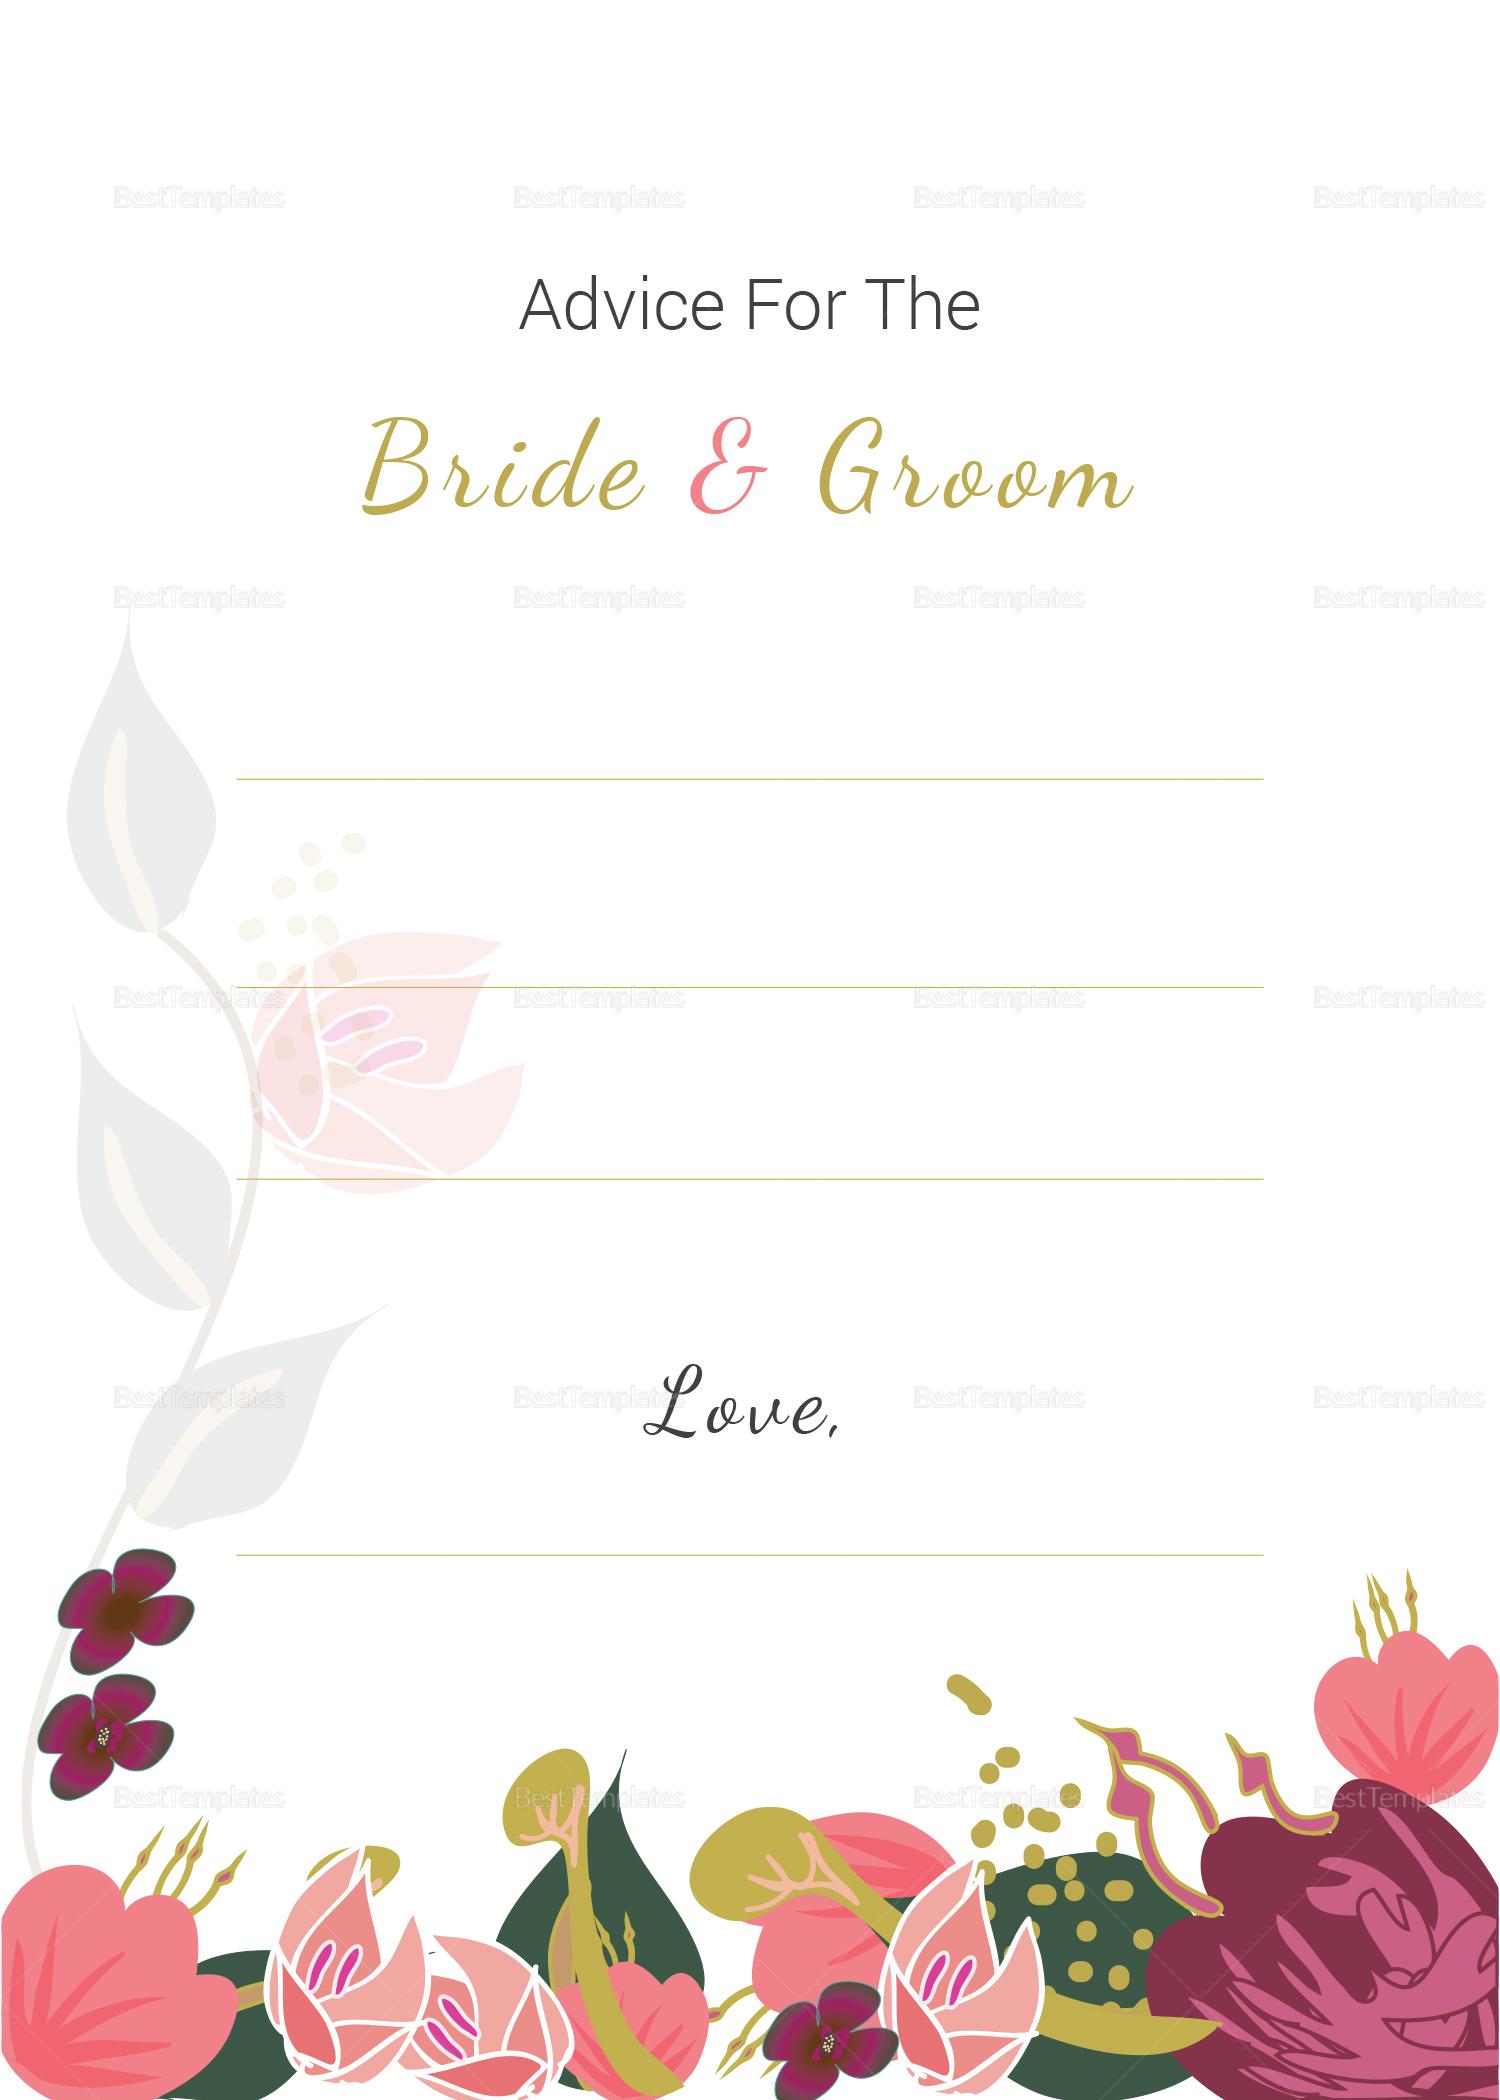 Burgundy Floral Wedding Advice Card